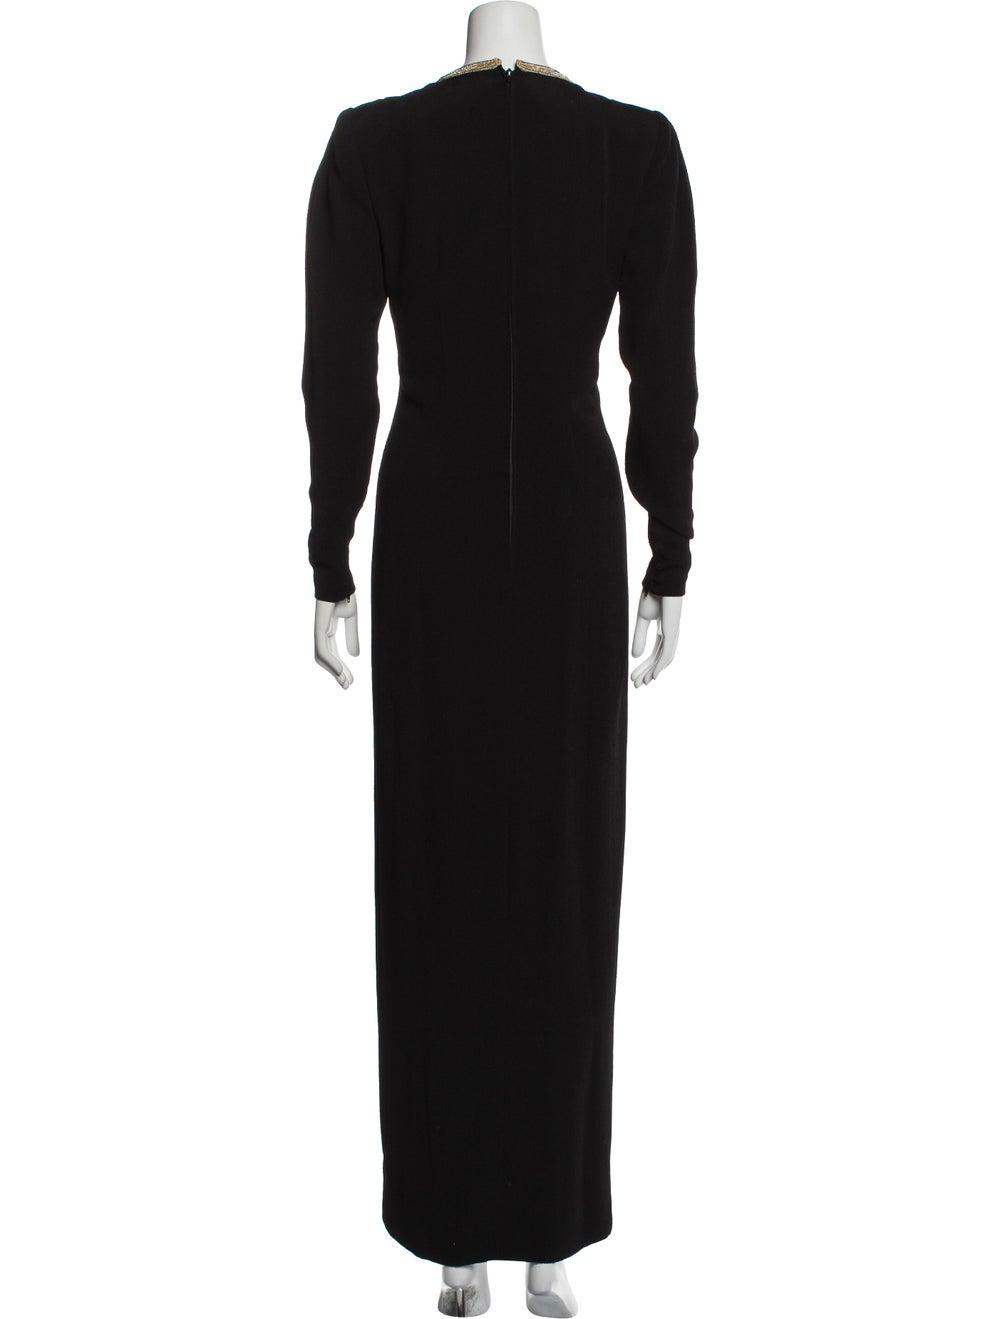 Pauline Trigere Vintage Long Dress Black - image 3